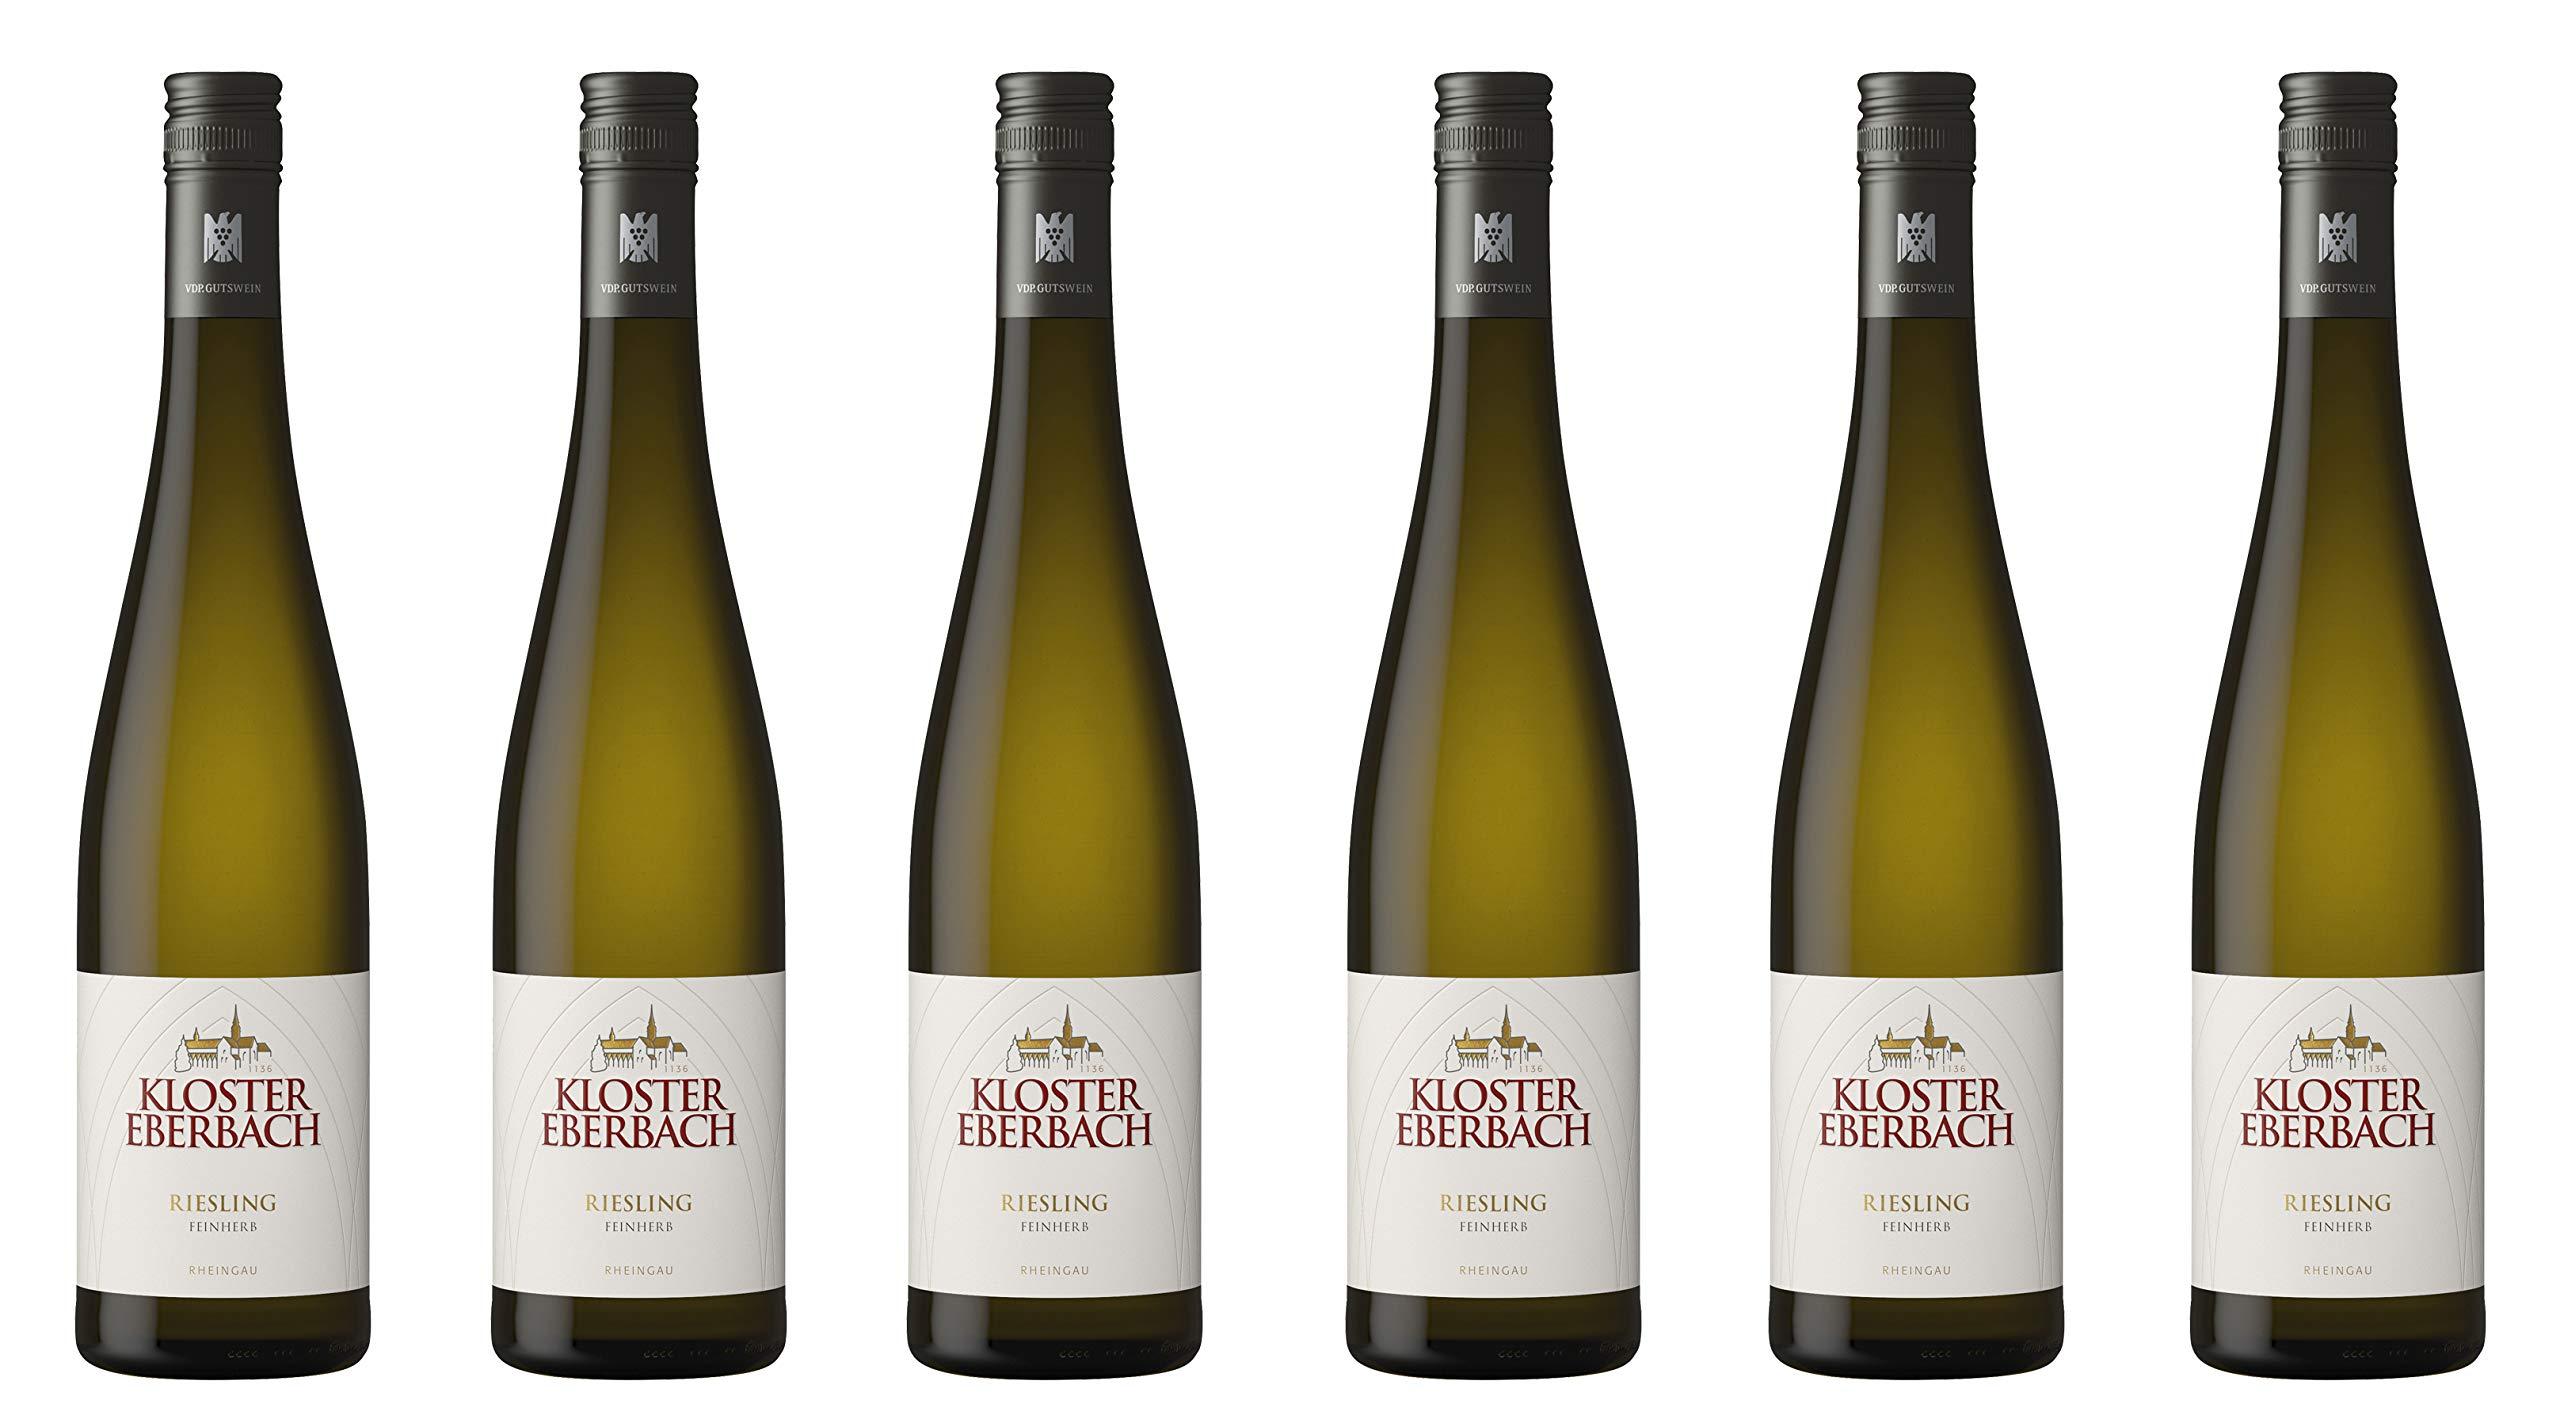 Kloster-Eberbach-Riesling-2017-Feinherb-125-vol-6-x-075-l